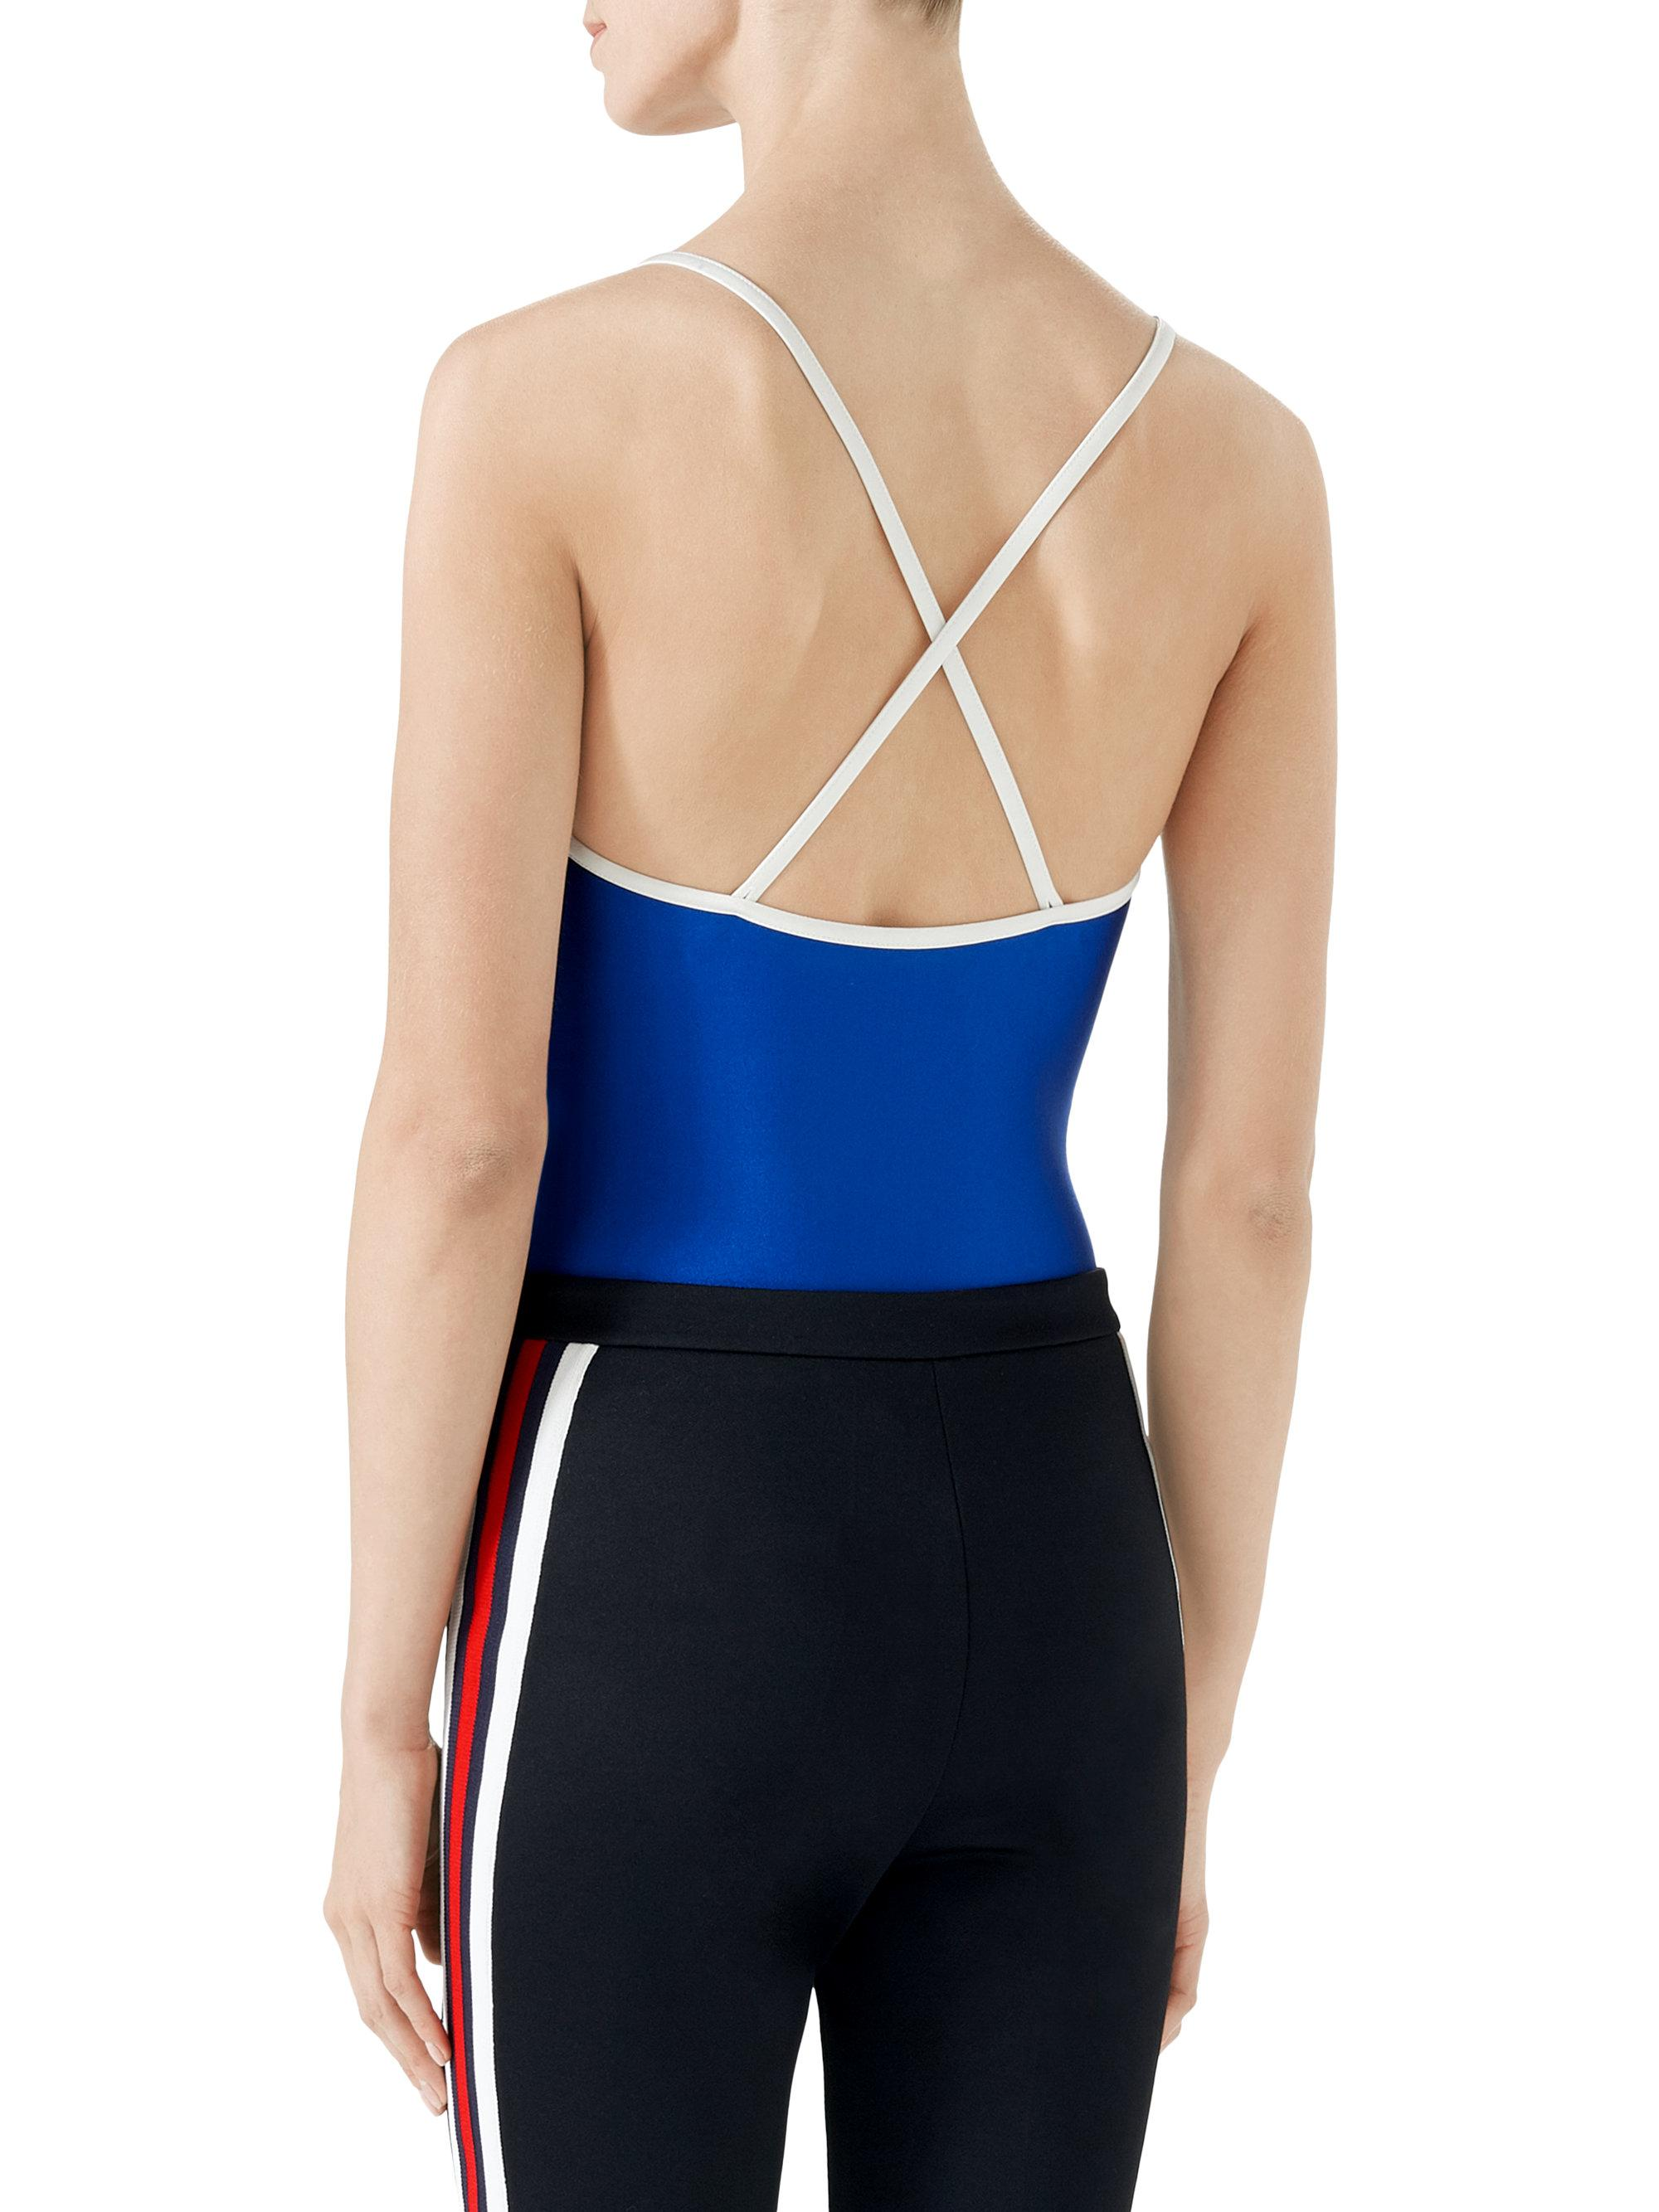 827a668a62cf65 Gucci Print Sparkling Bodysuit in Blue - Lyst